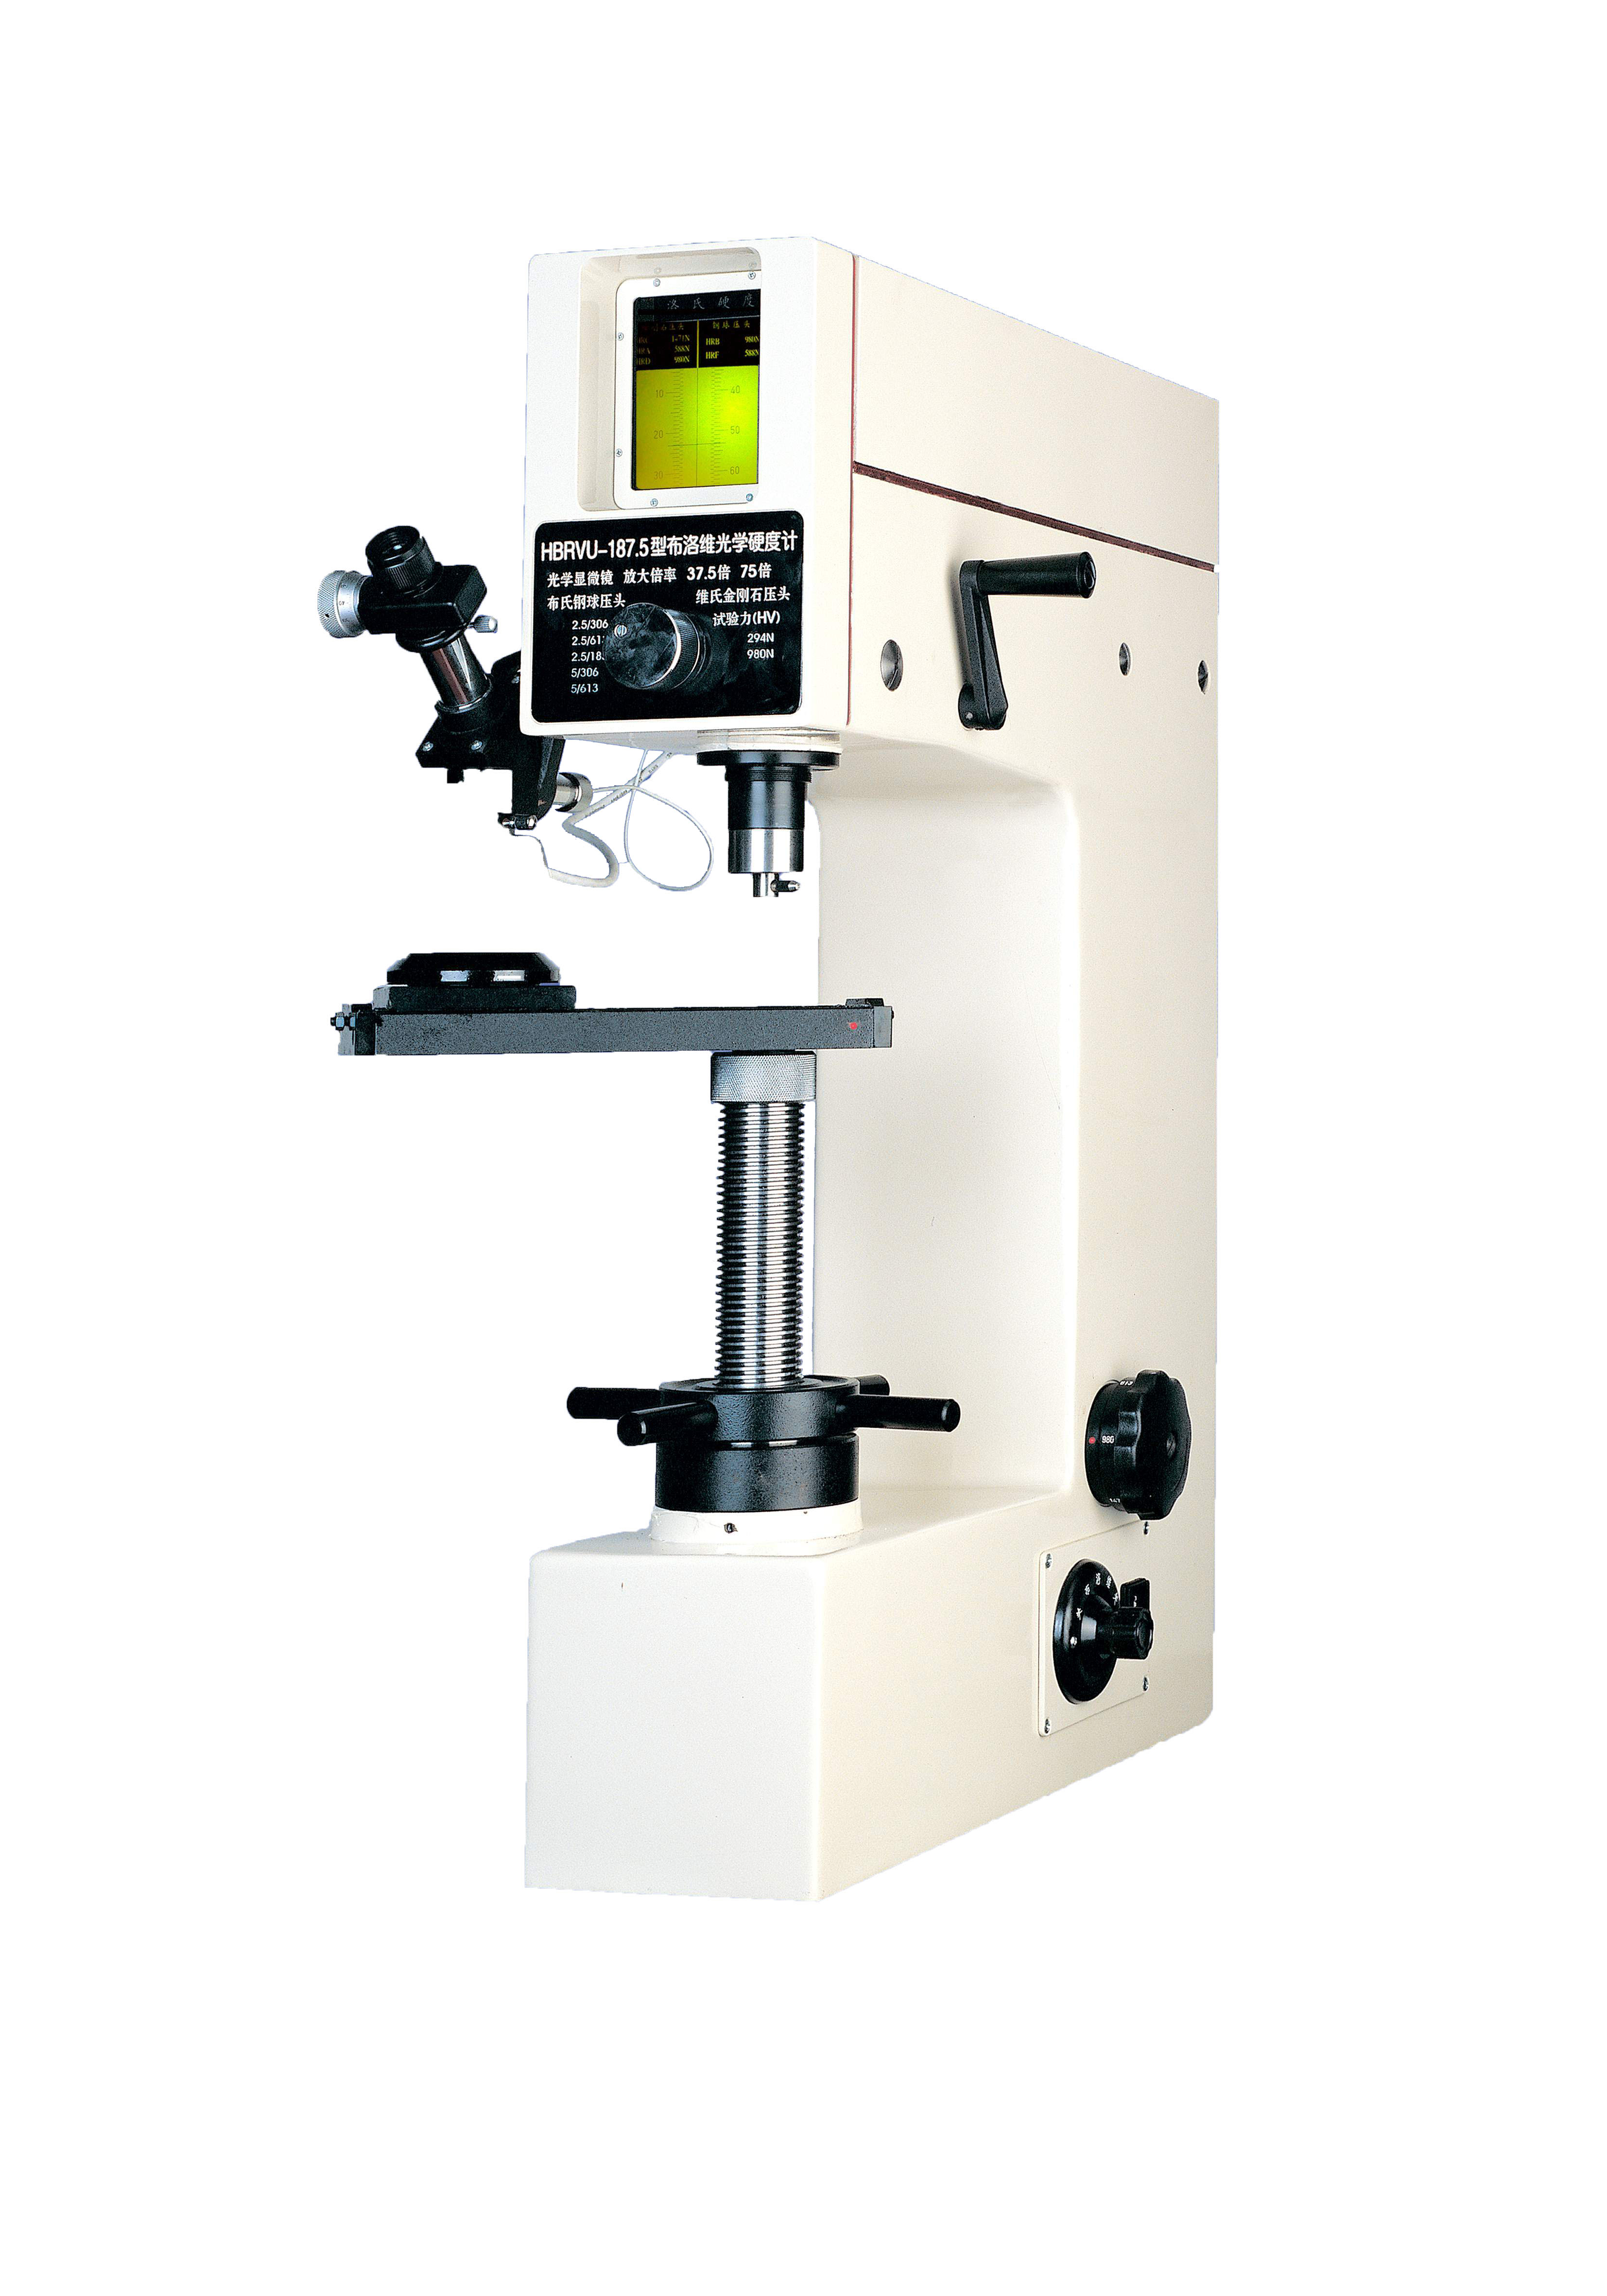 HBRVU-187.5型布洛维光学硬度计